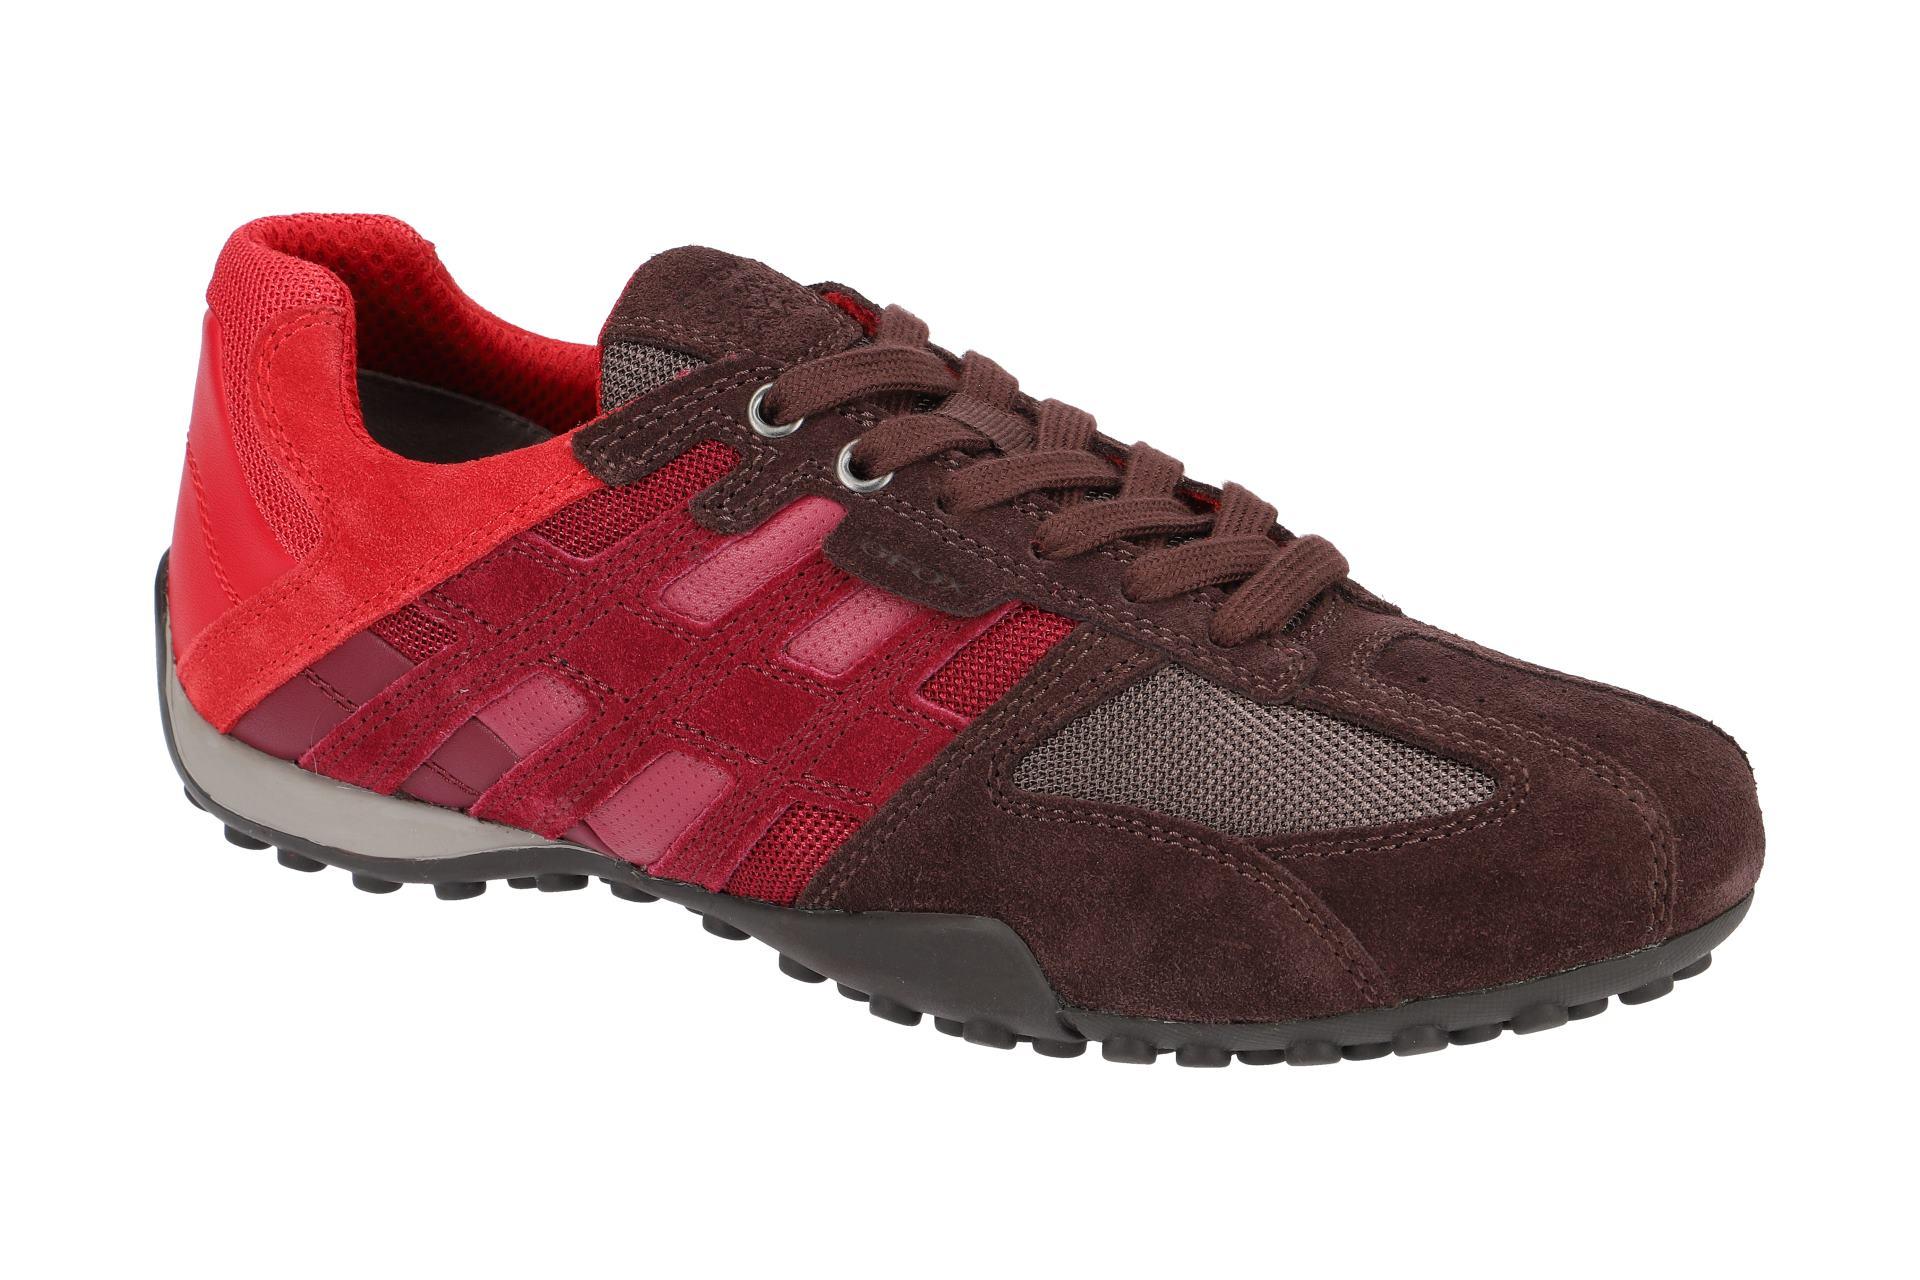 e0883f8b3d4398 Geox Schuhe SNAKE rot Herrenschuhe Sneakers U8207E 02214 C7J7W NEU ...